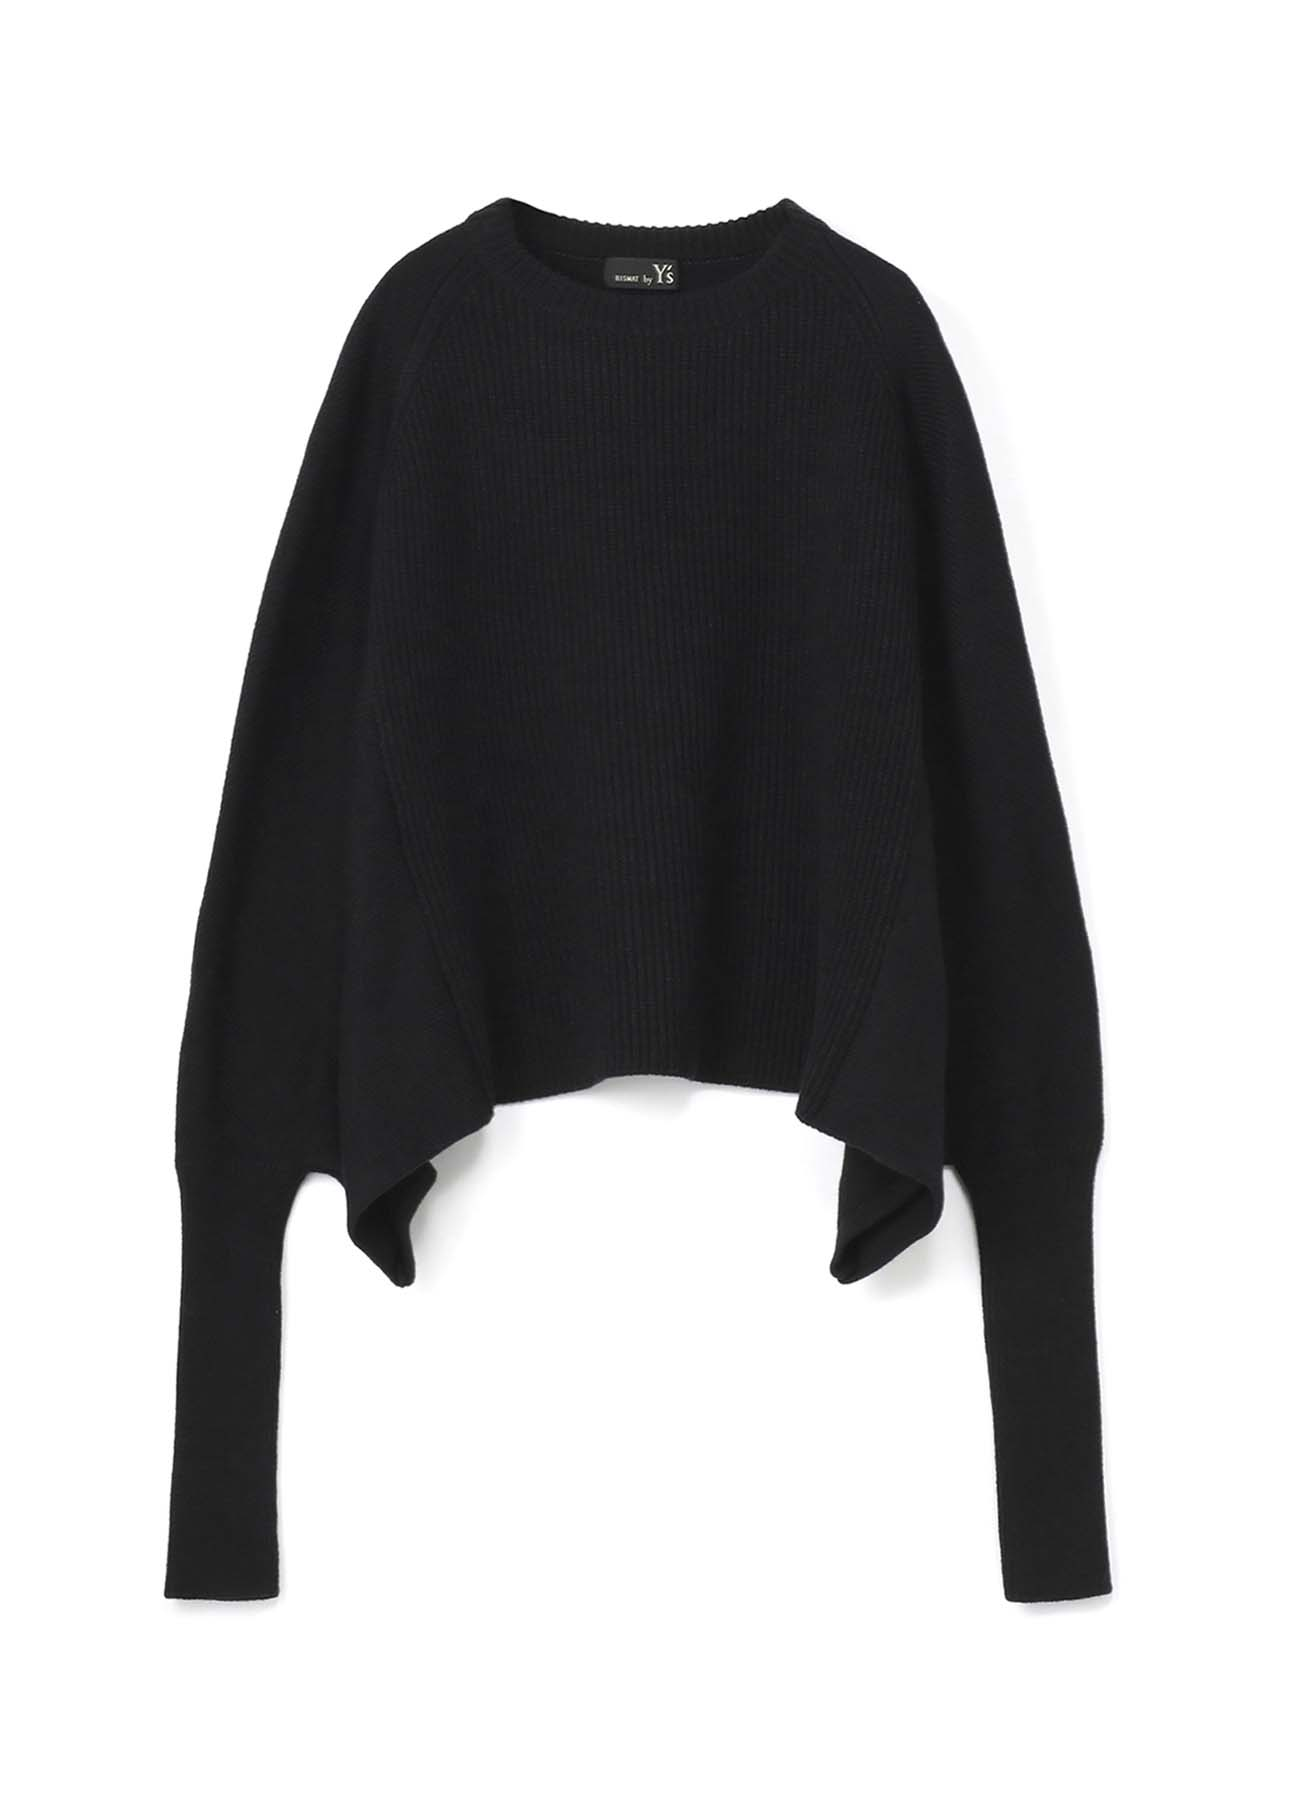 RISMATbyY的多层混合单针织袋开缝变形套衫